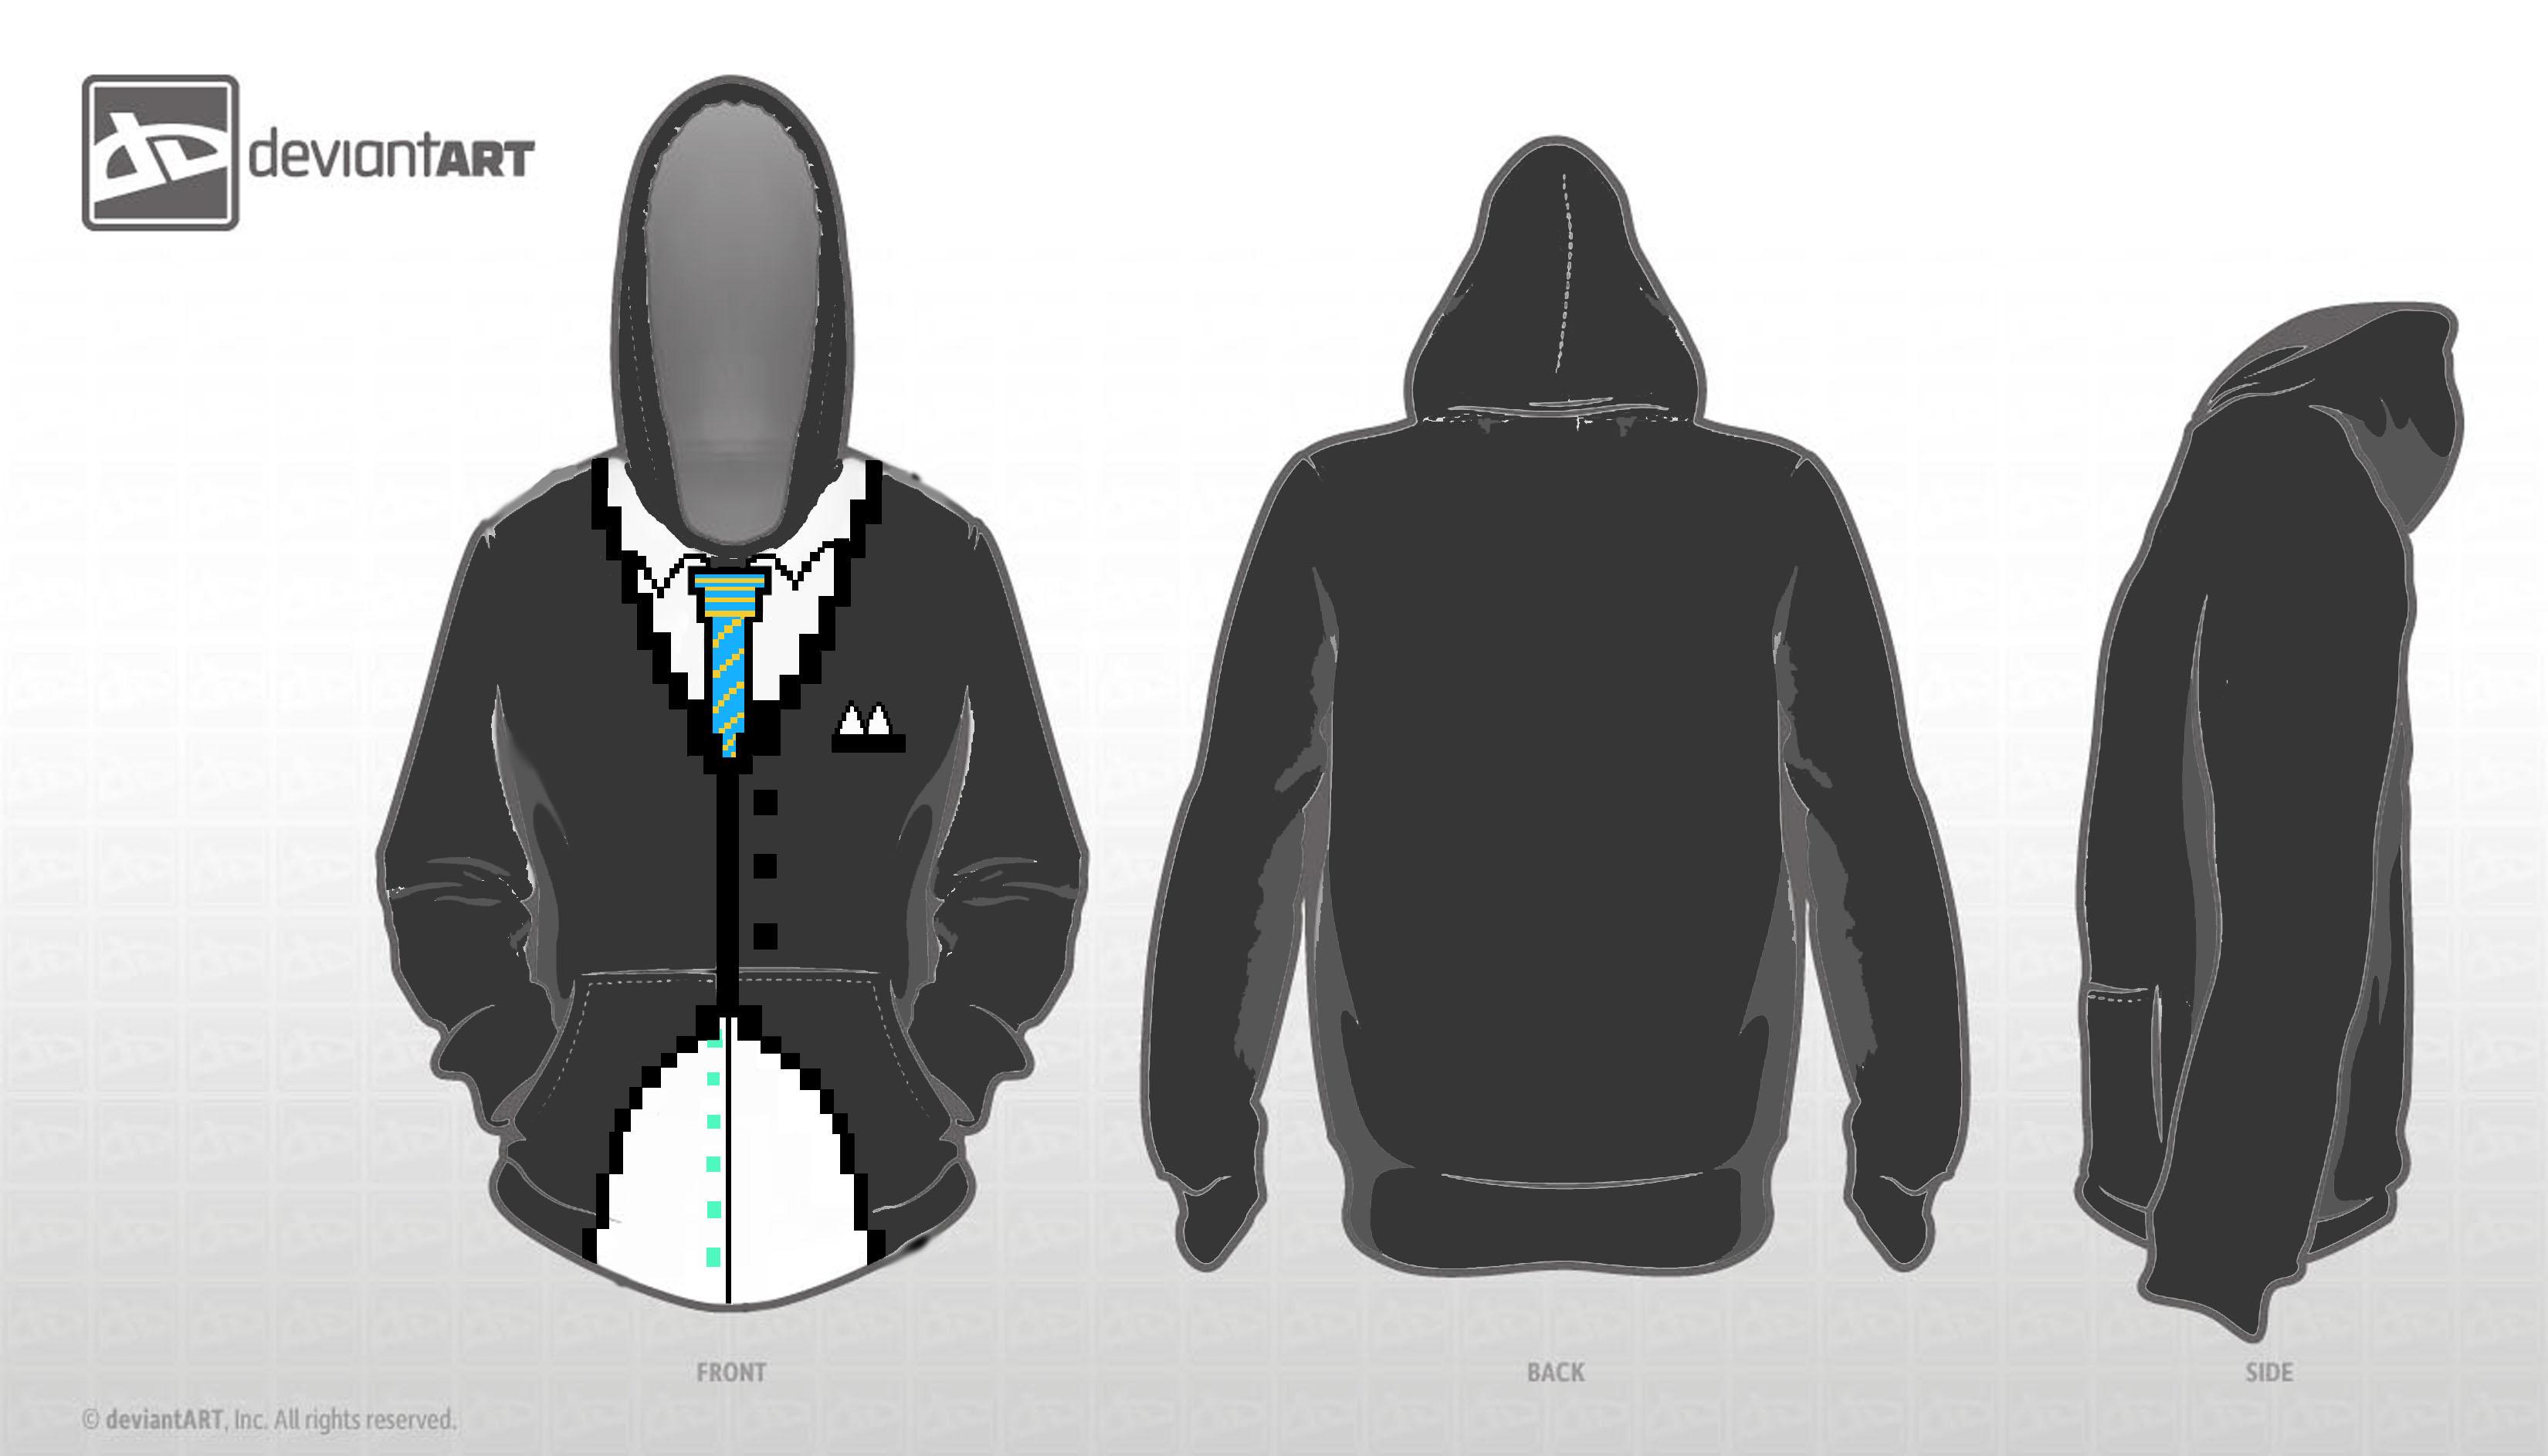 8-BIt Suit Sweatshirt by Ichi-BanOtakuSML8500